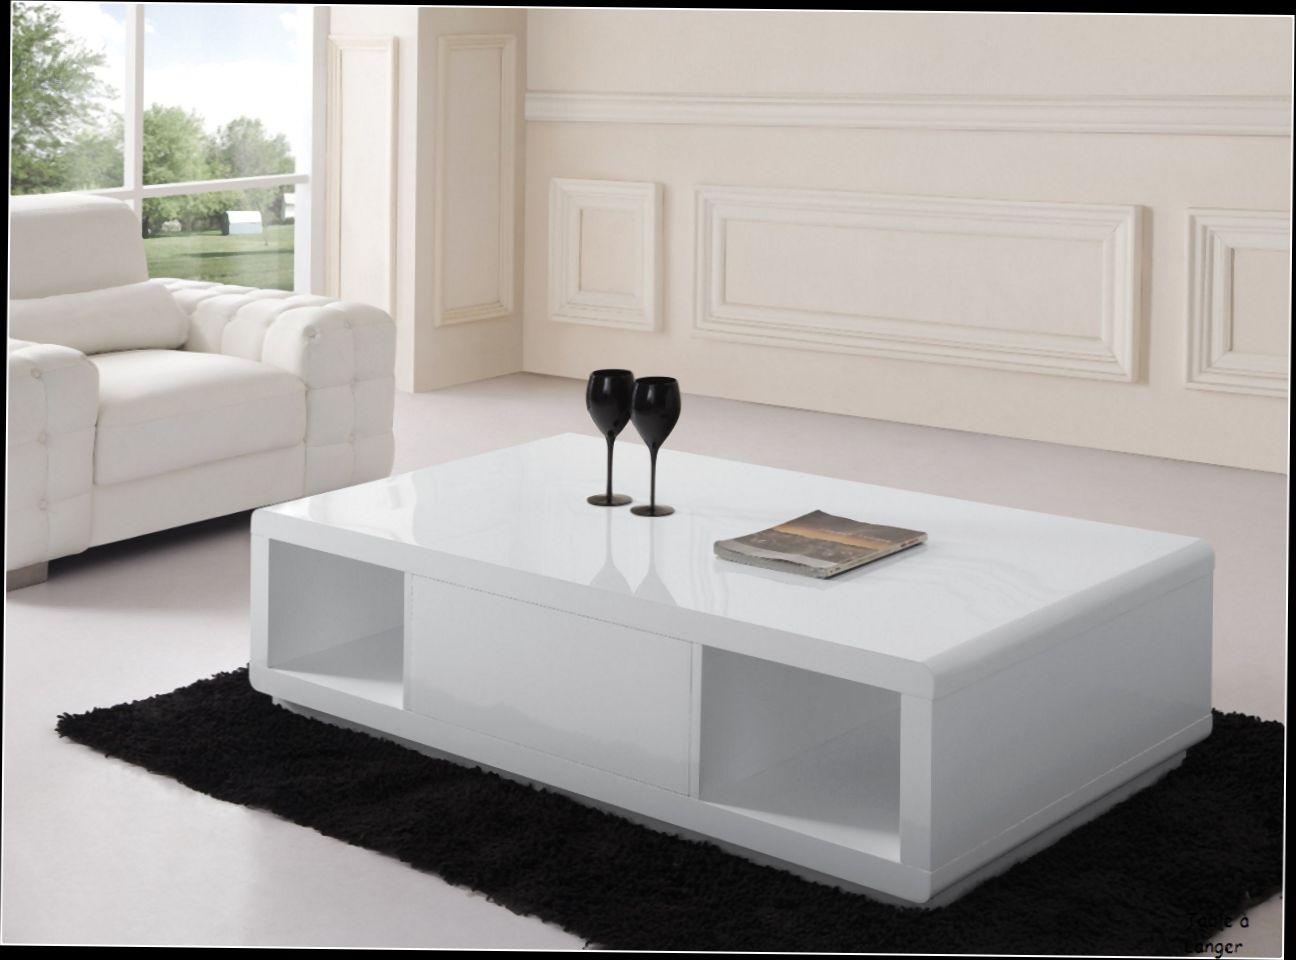 Table Basse Avec Plateau Relevable Ikea